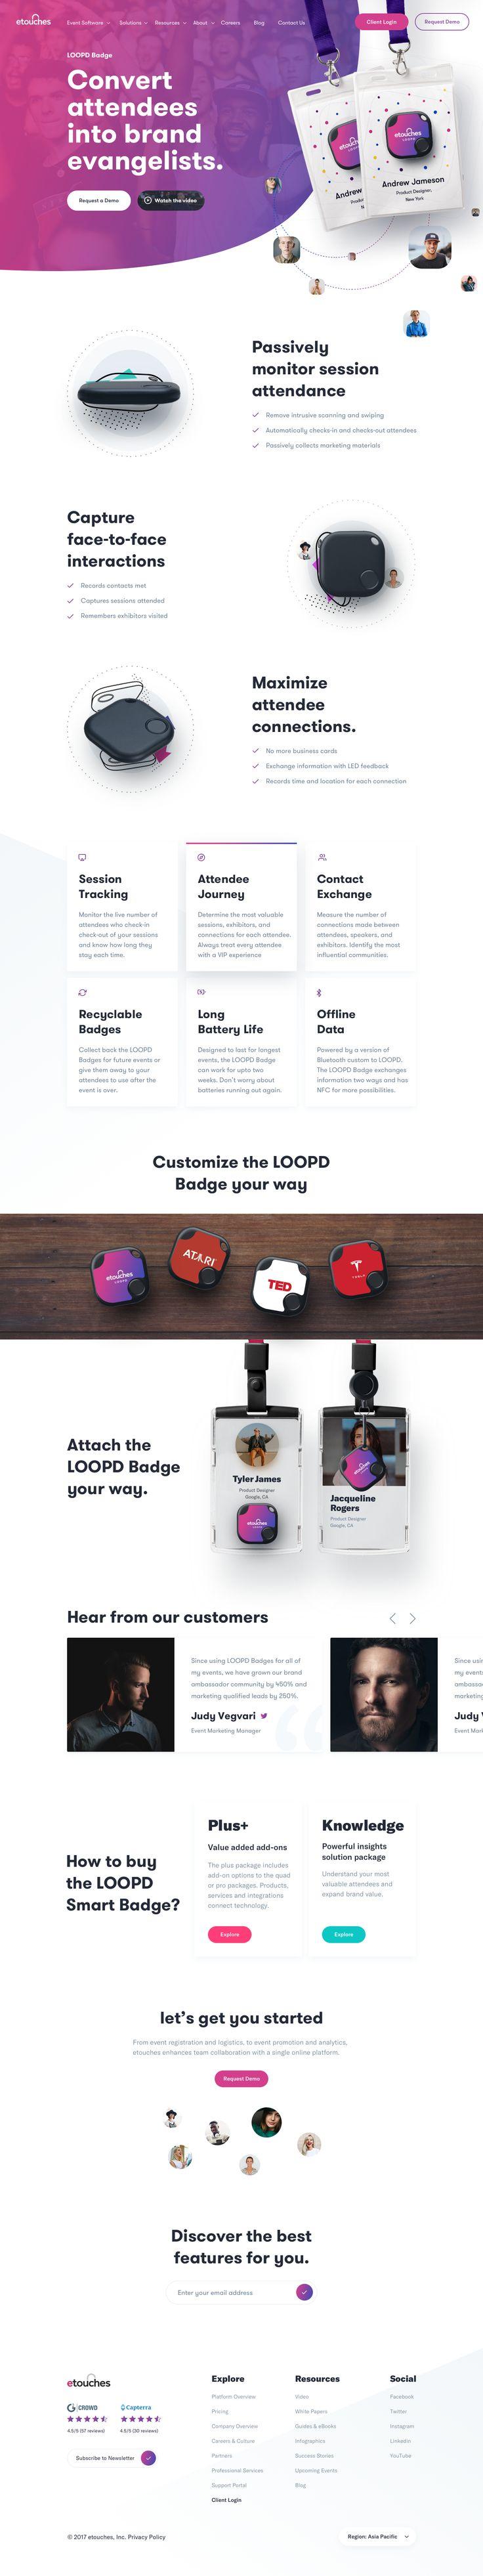 Loopd badge dribbble